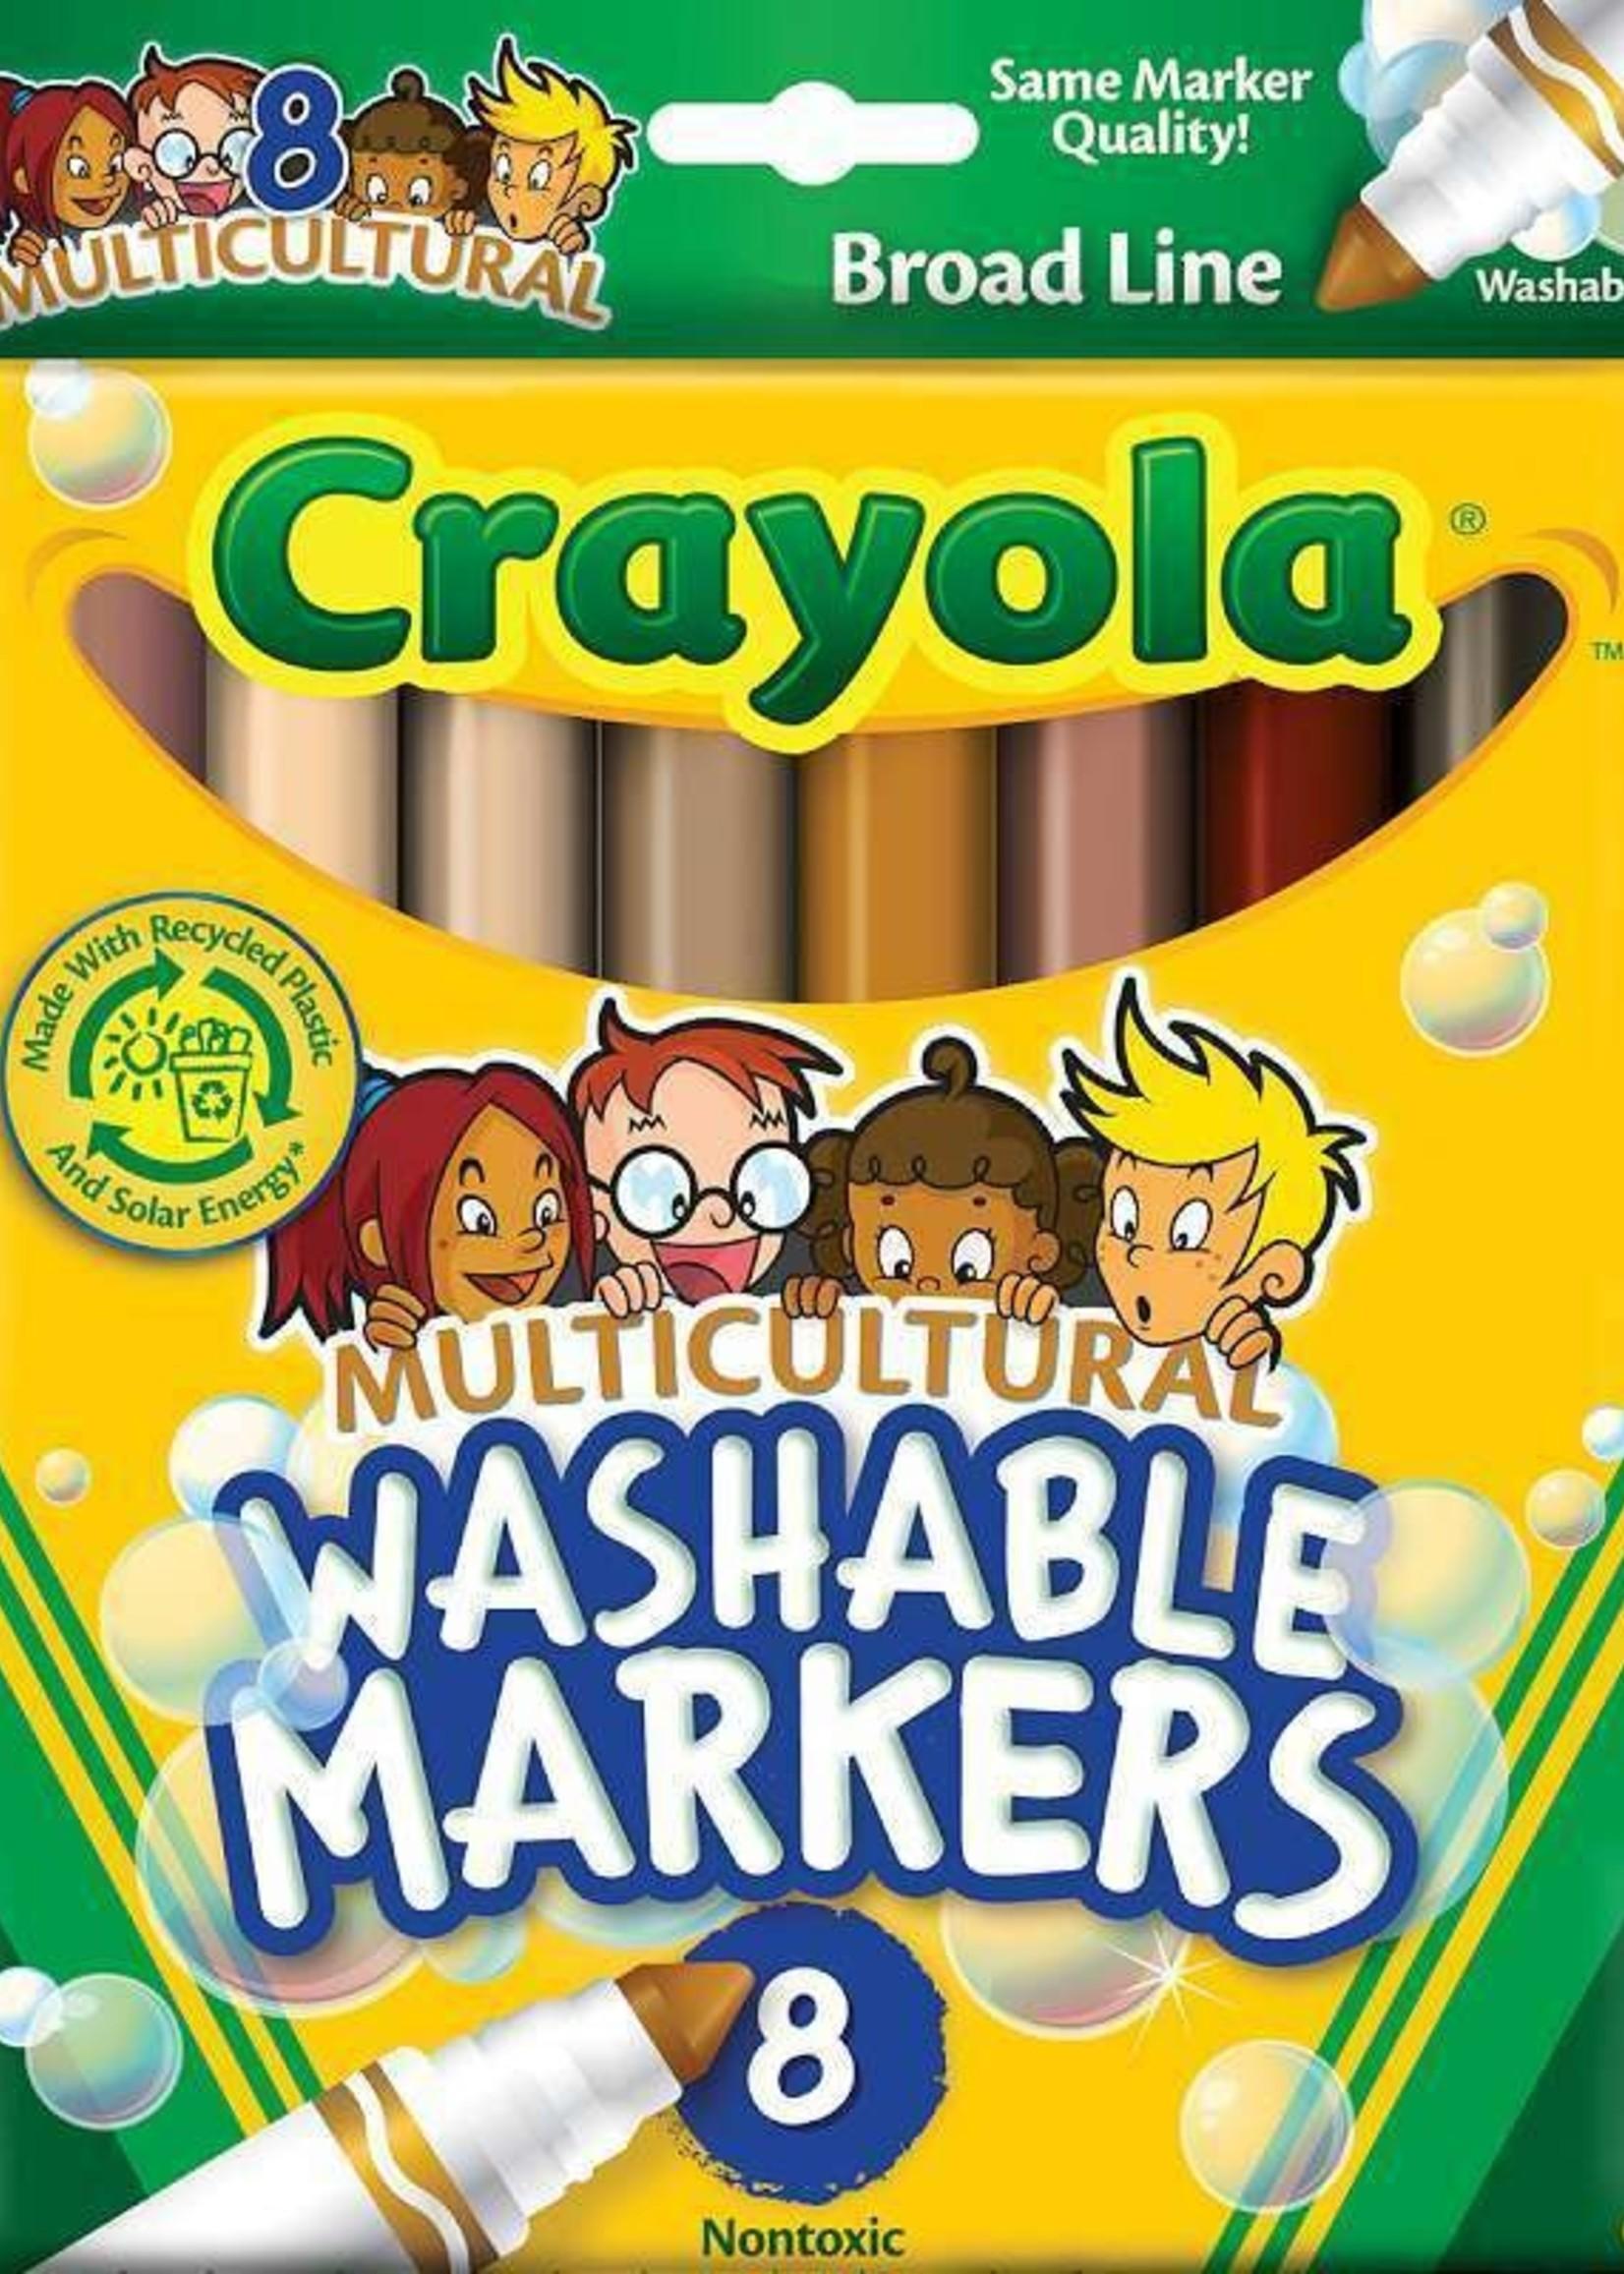 CRAYOLA CRAYOLA WASHABLE MARKERS